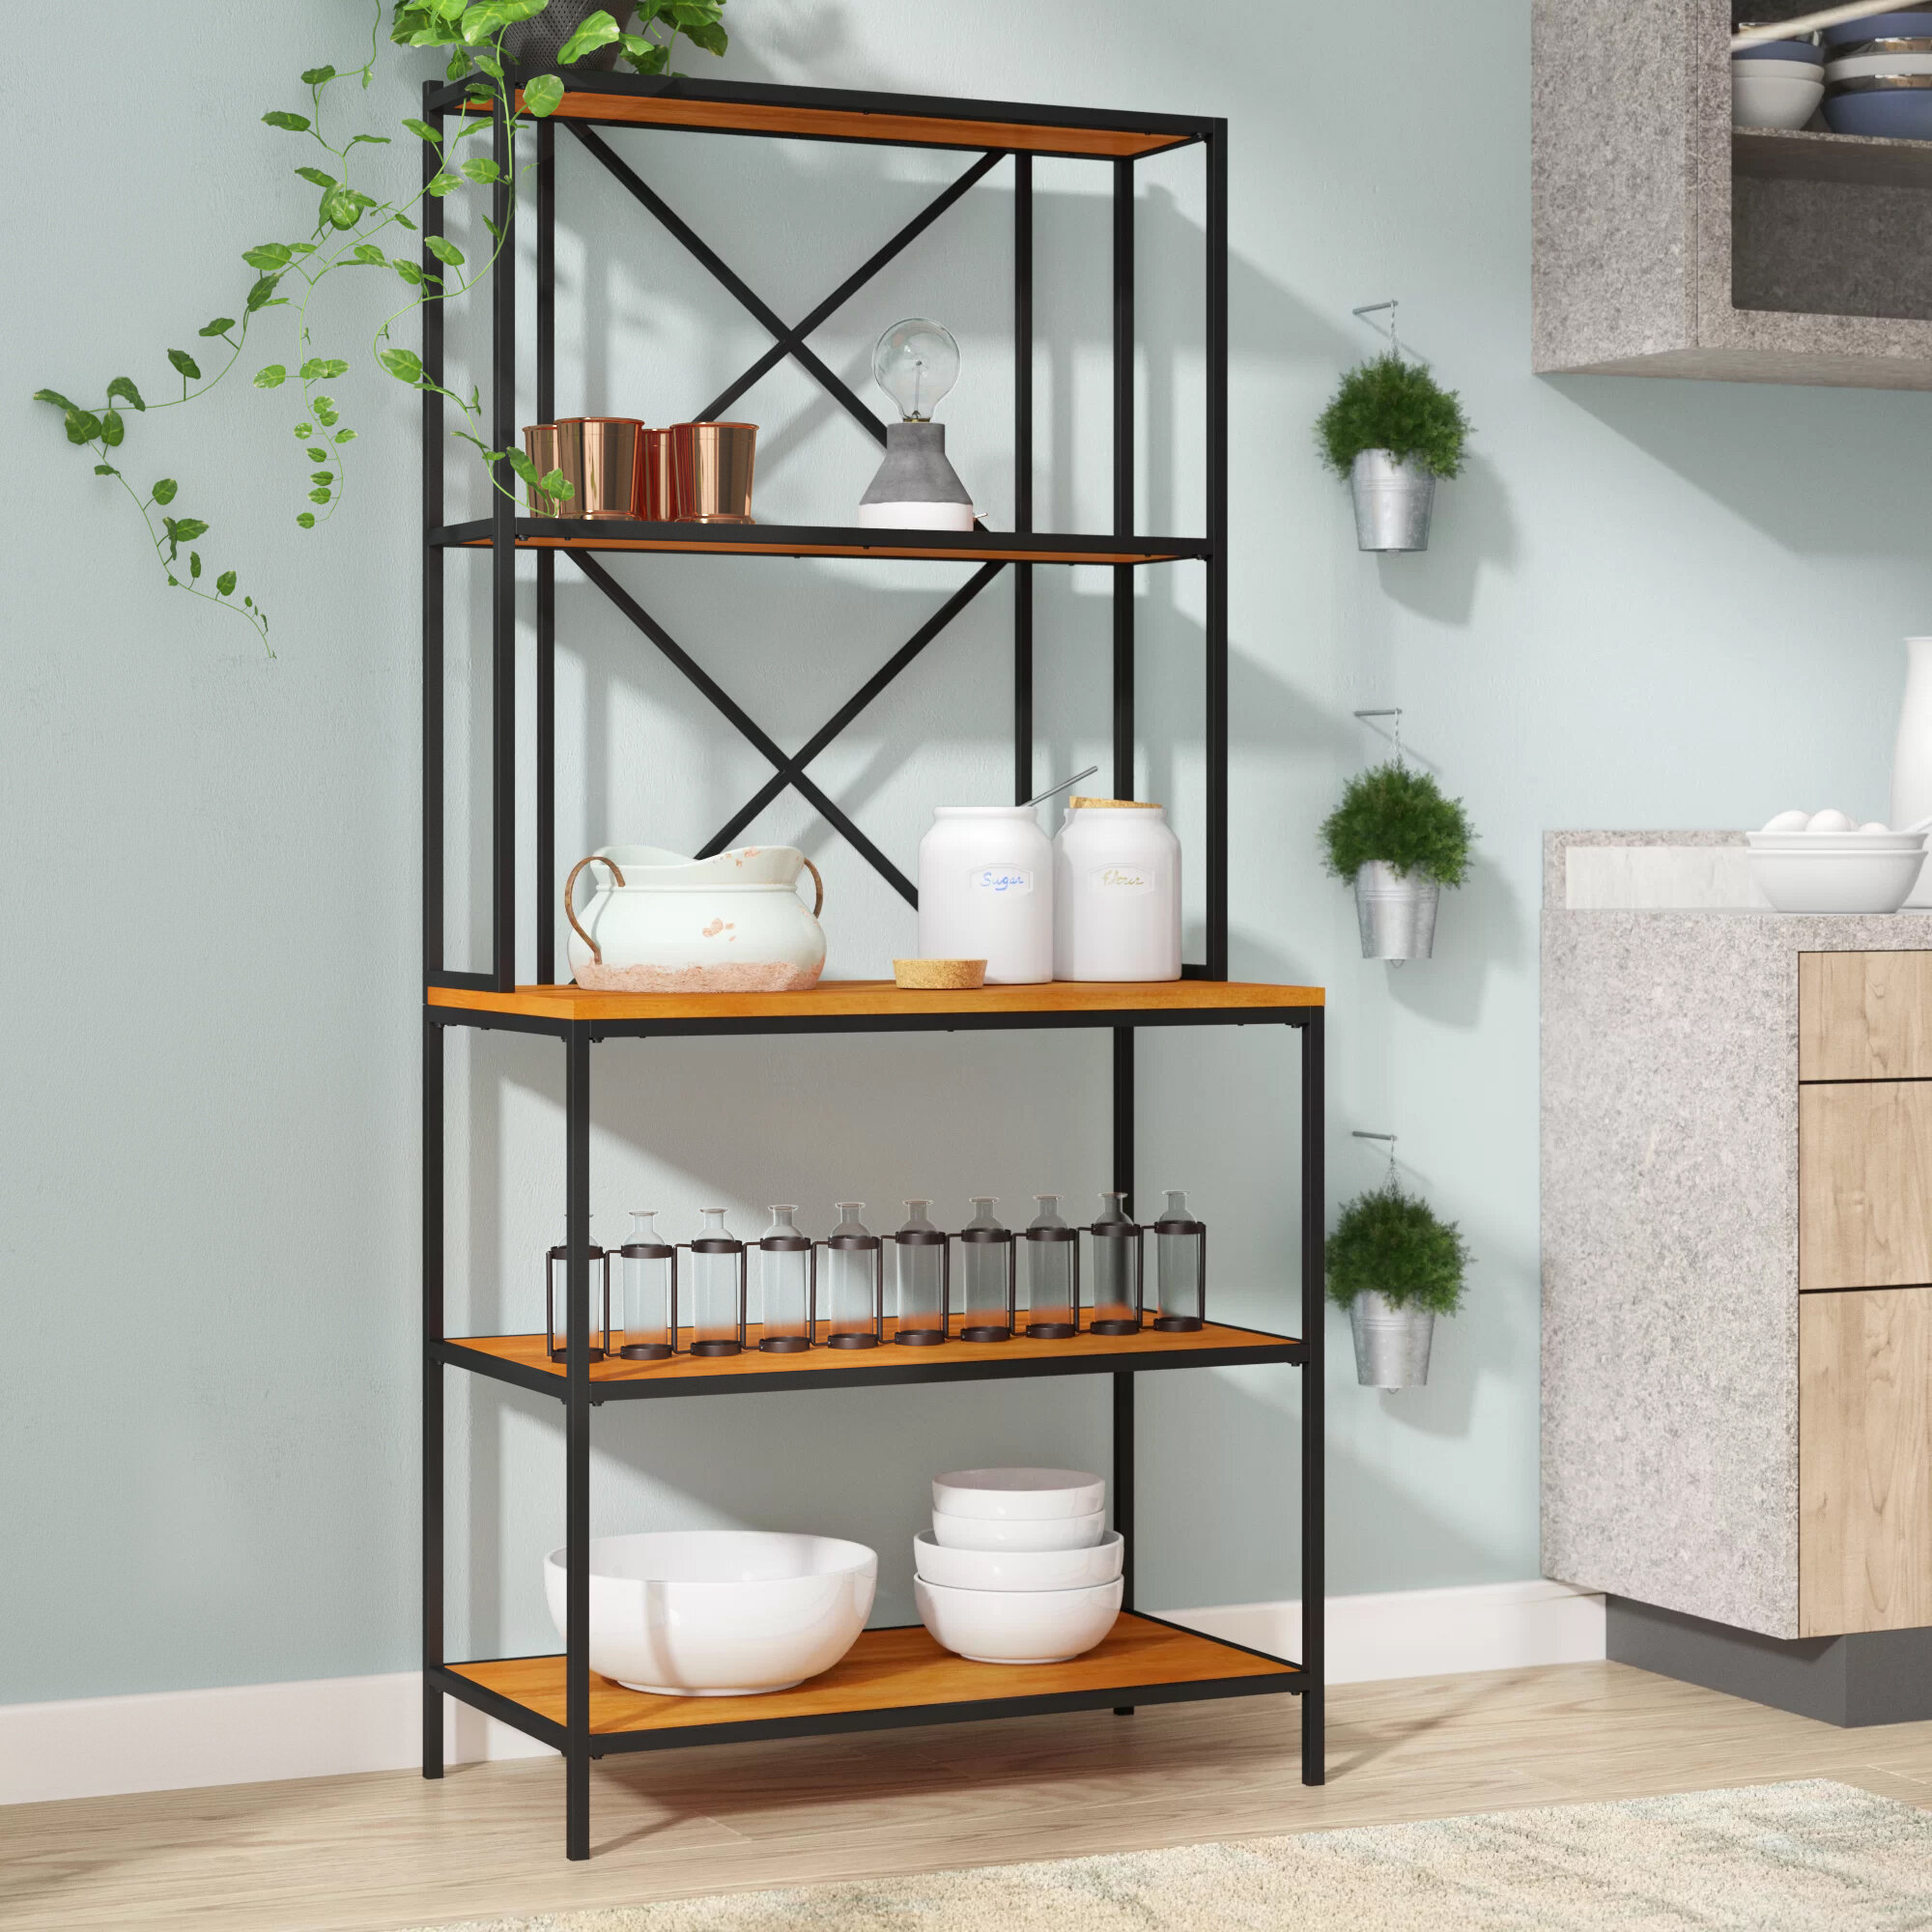 Wrought Iron Bakers Rack Scroll Metal Narrow 5 Shelf Kitchen Storage Organizer